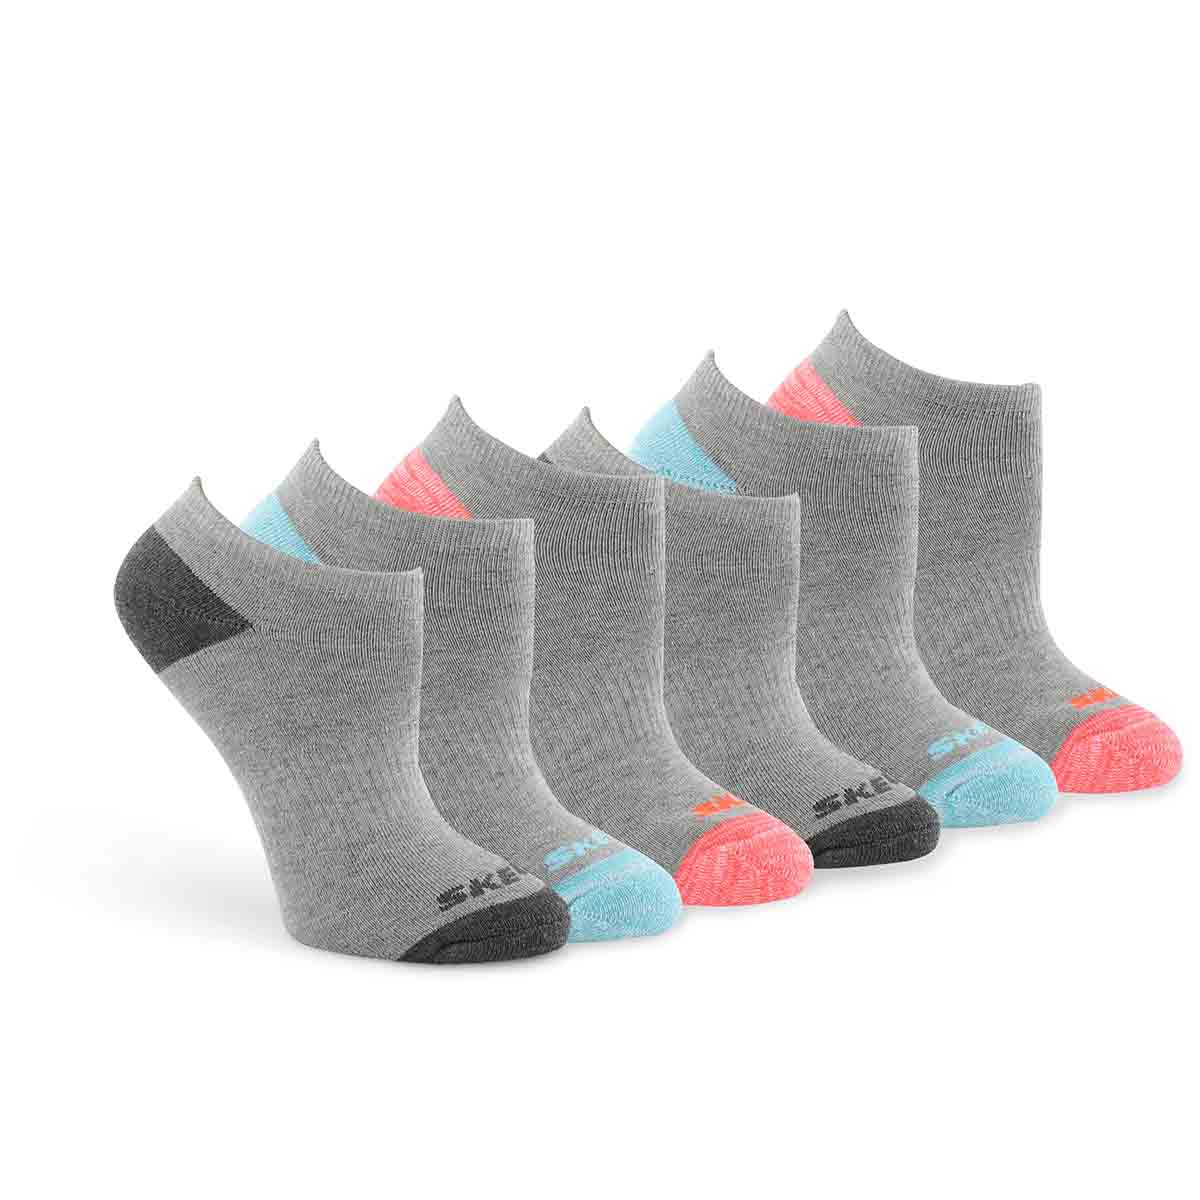 Women's NO SHOW FULL TERRY grey multi socks - 6 pk